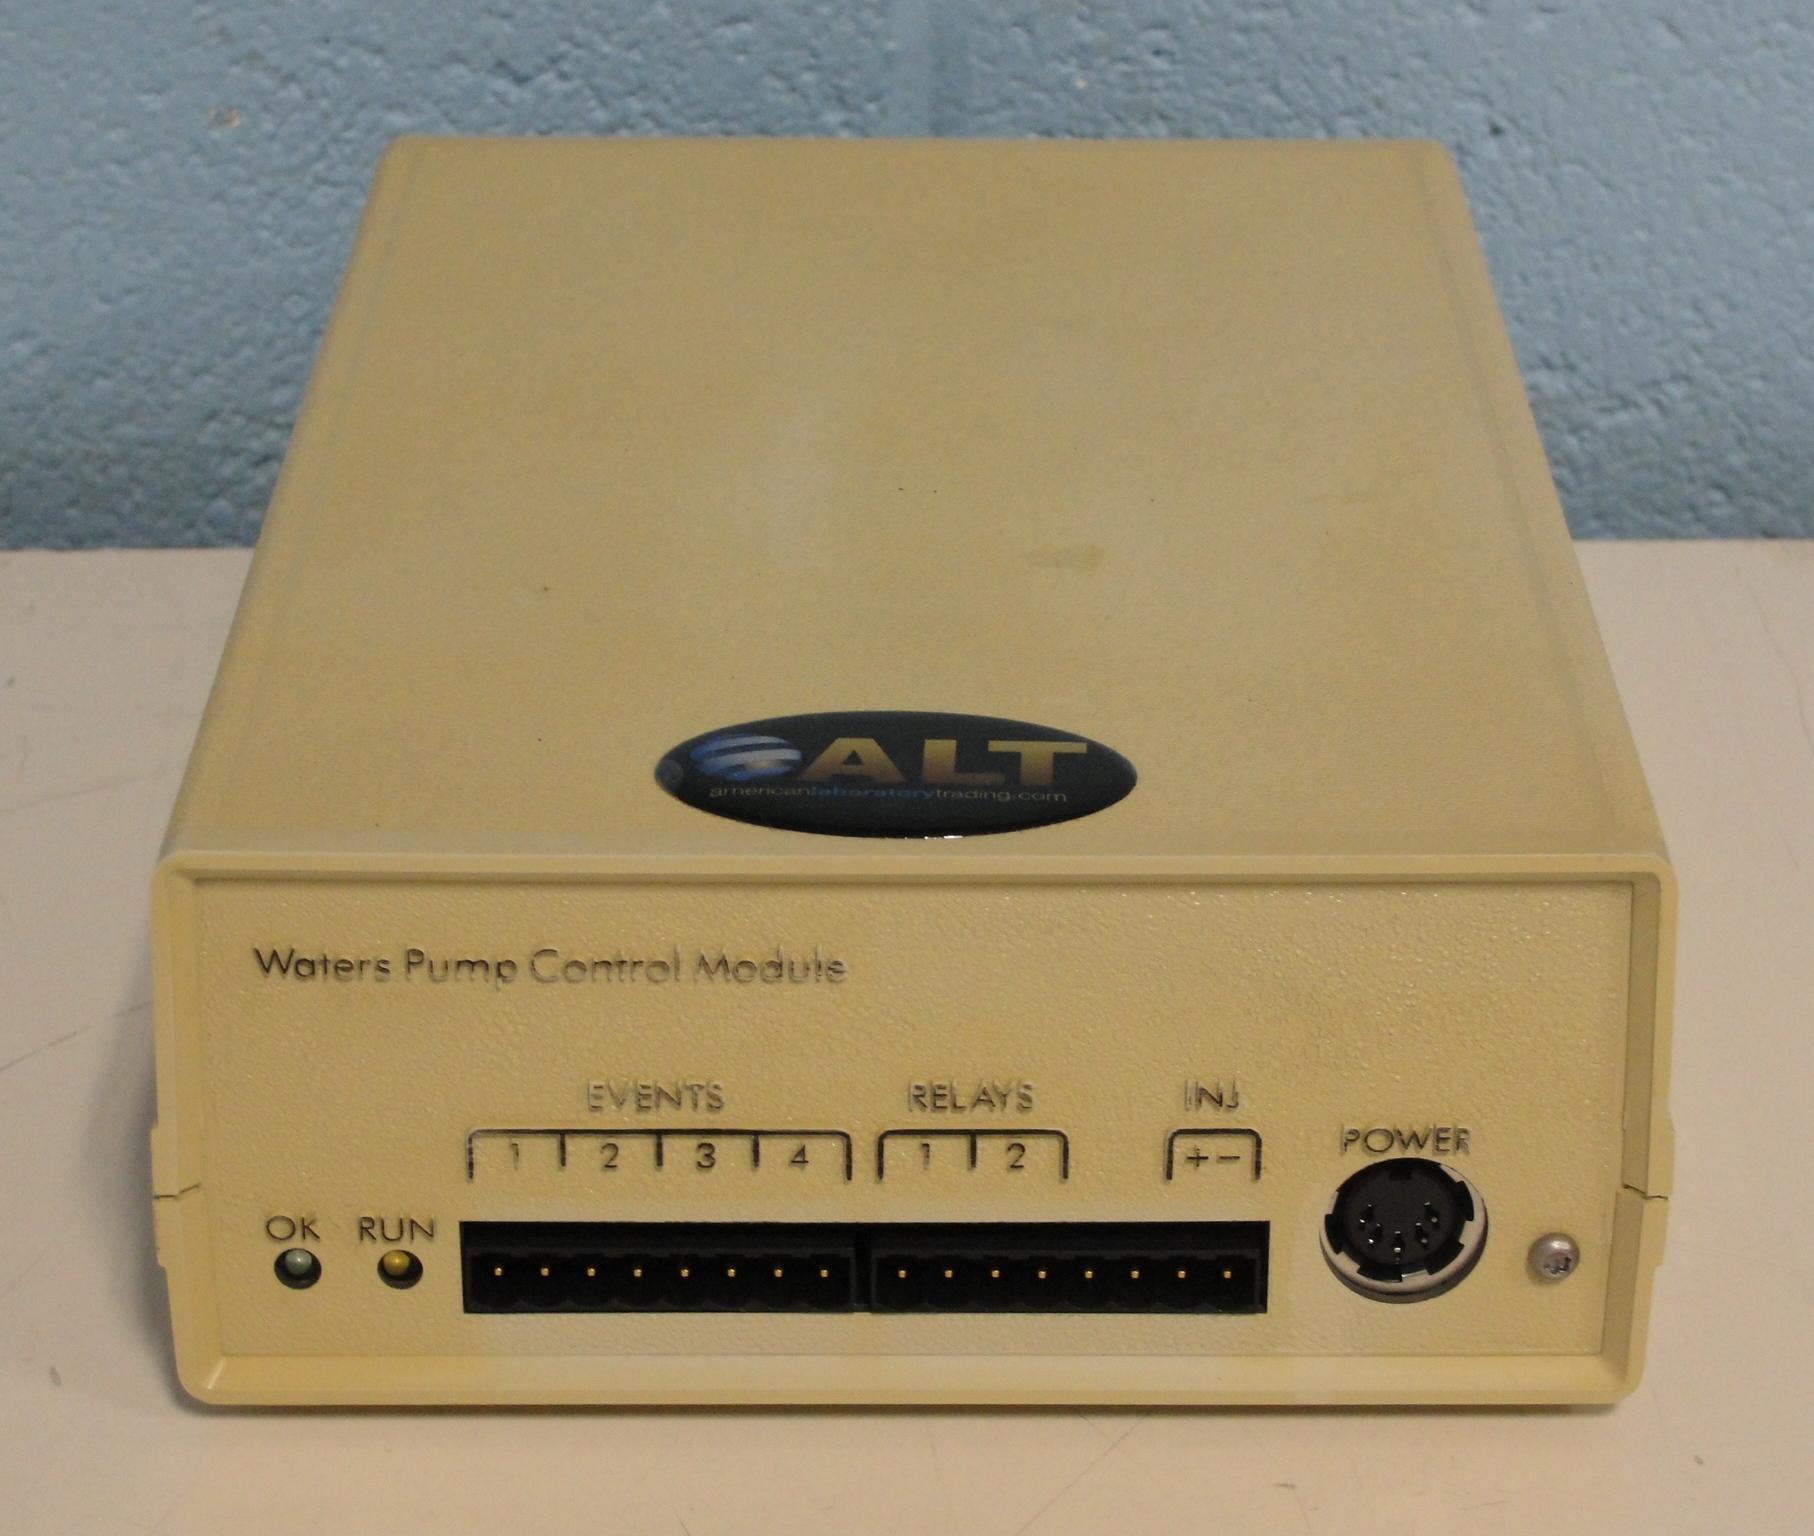 Waters Pump Control Module Image